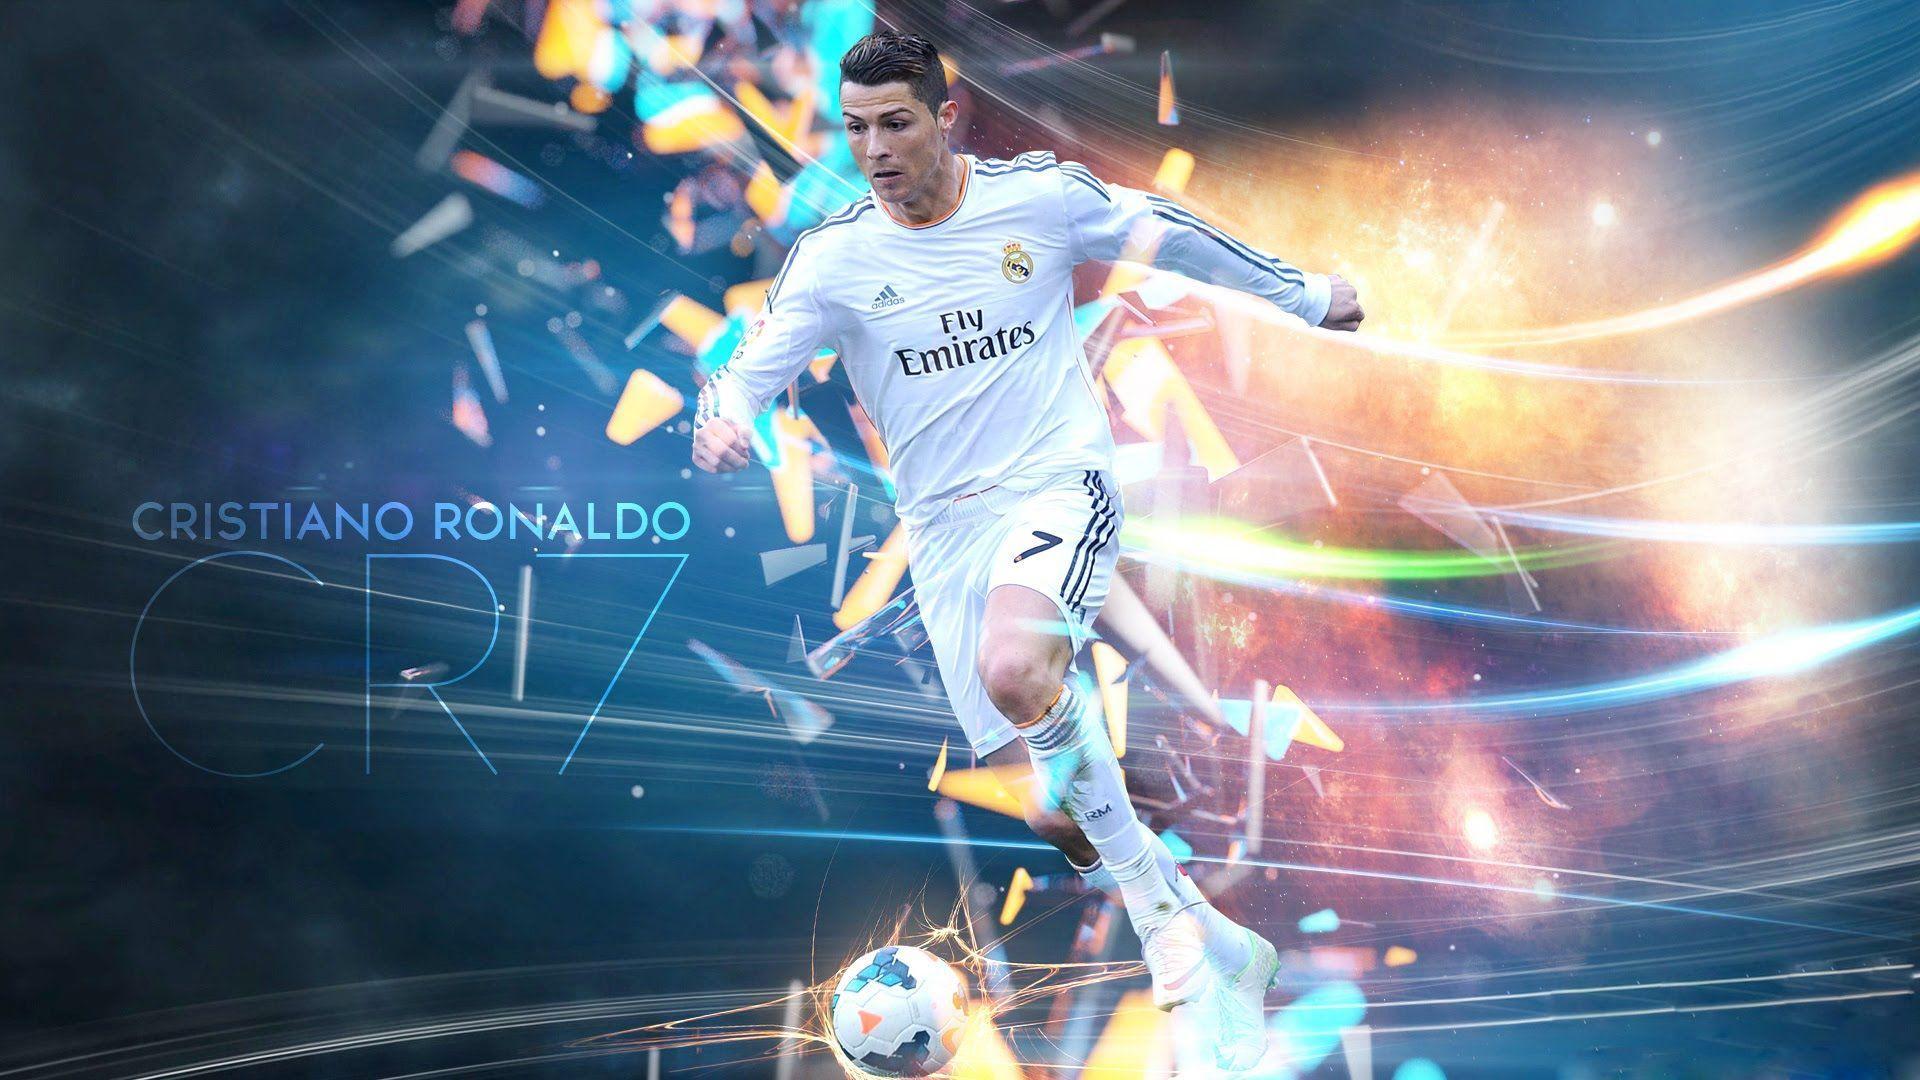 1920x1080 Cristiano Ronaldo Hình nền Full HD [1920x1080]